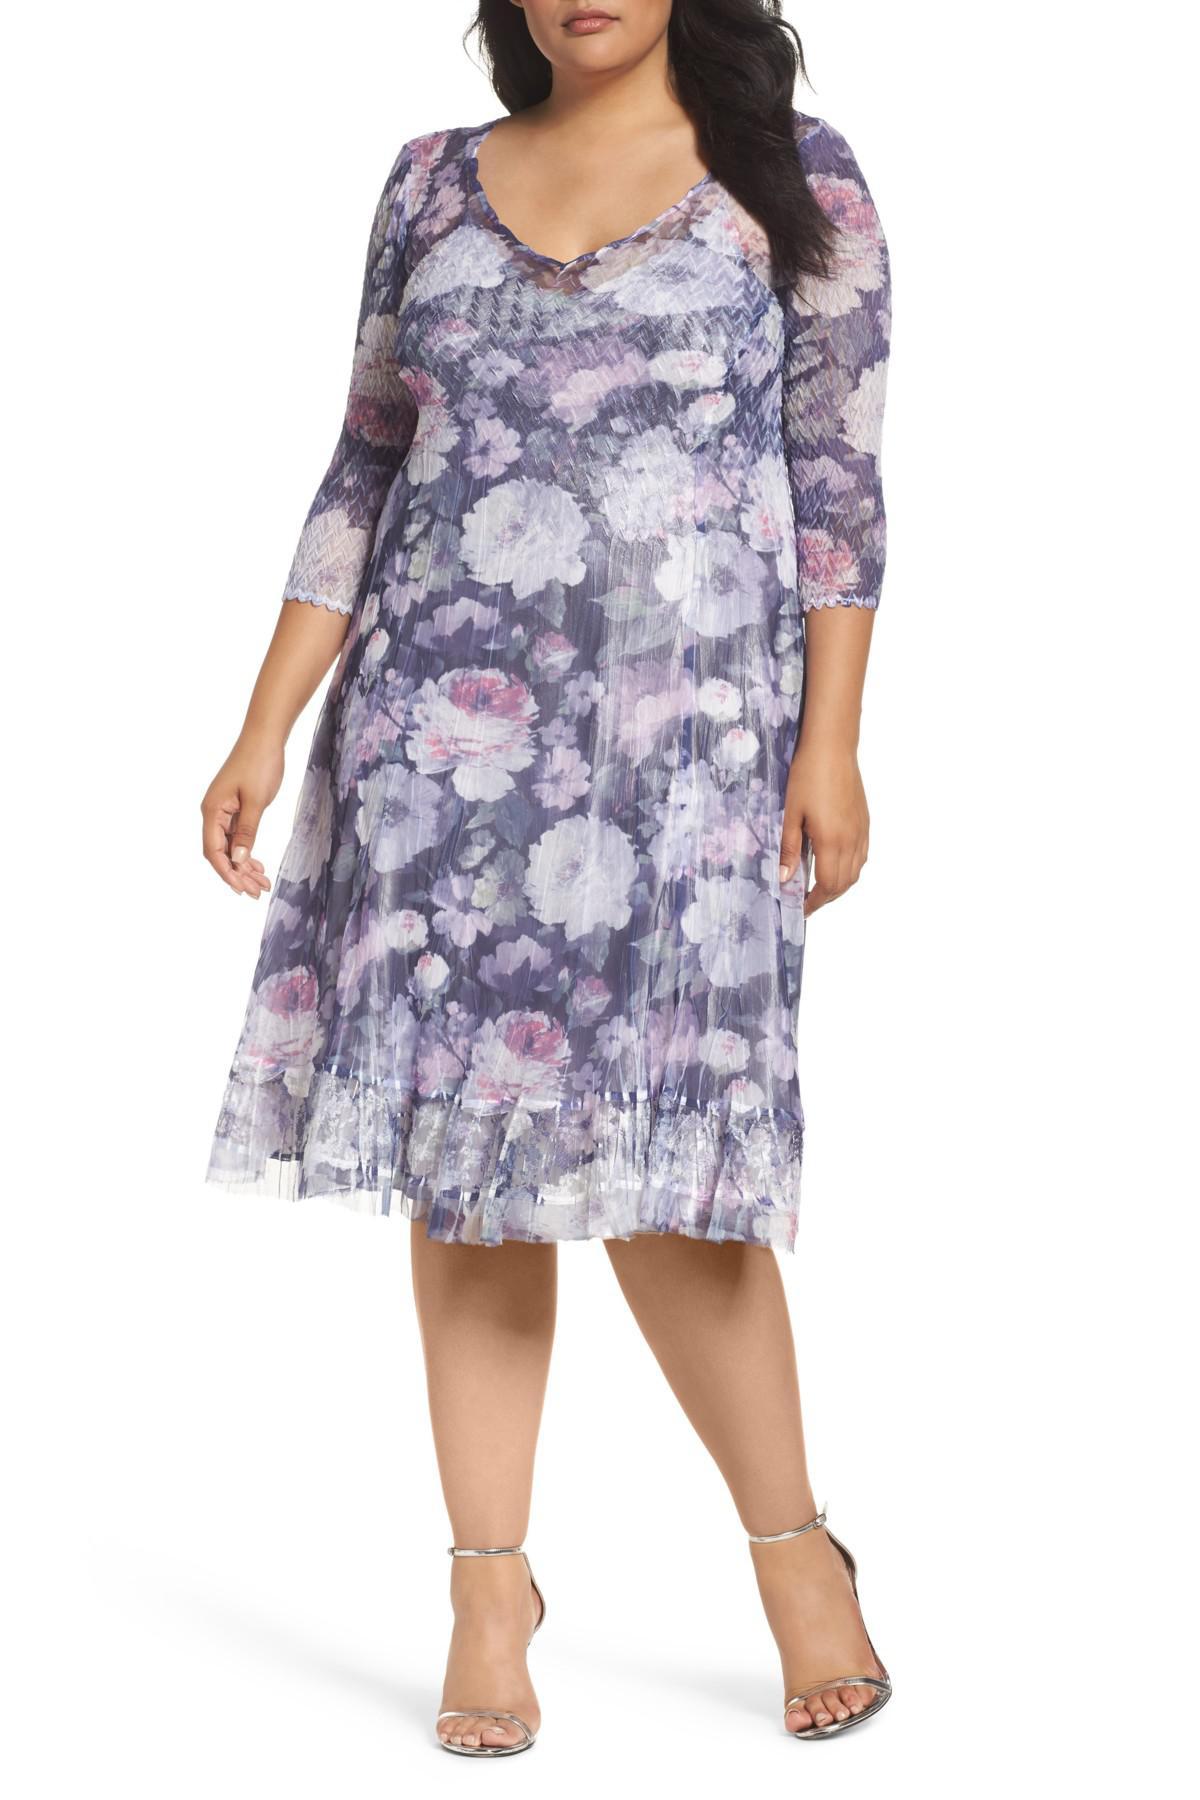 Lyst - Komarov Mixed Media A-line Dress (plus Size)